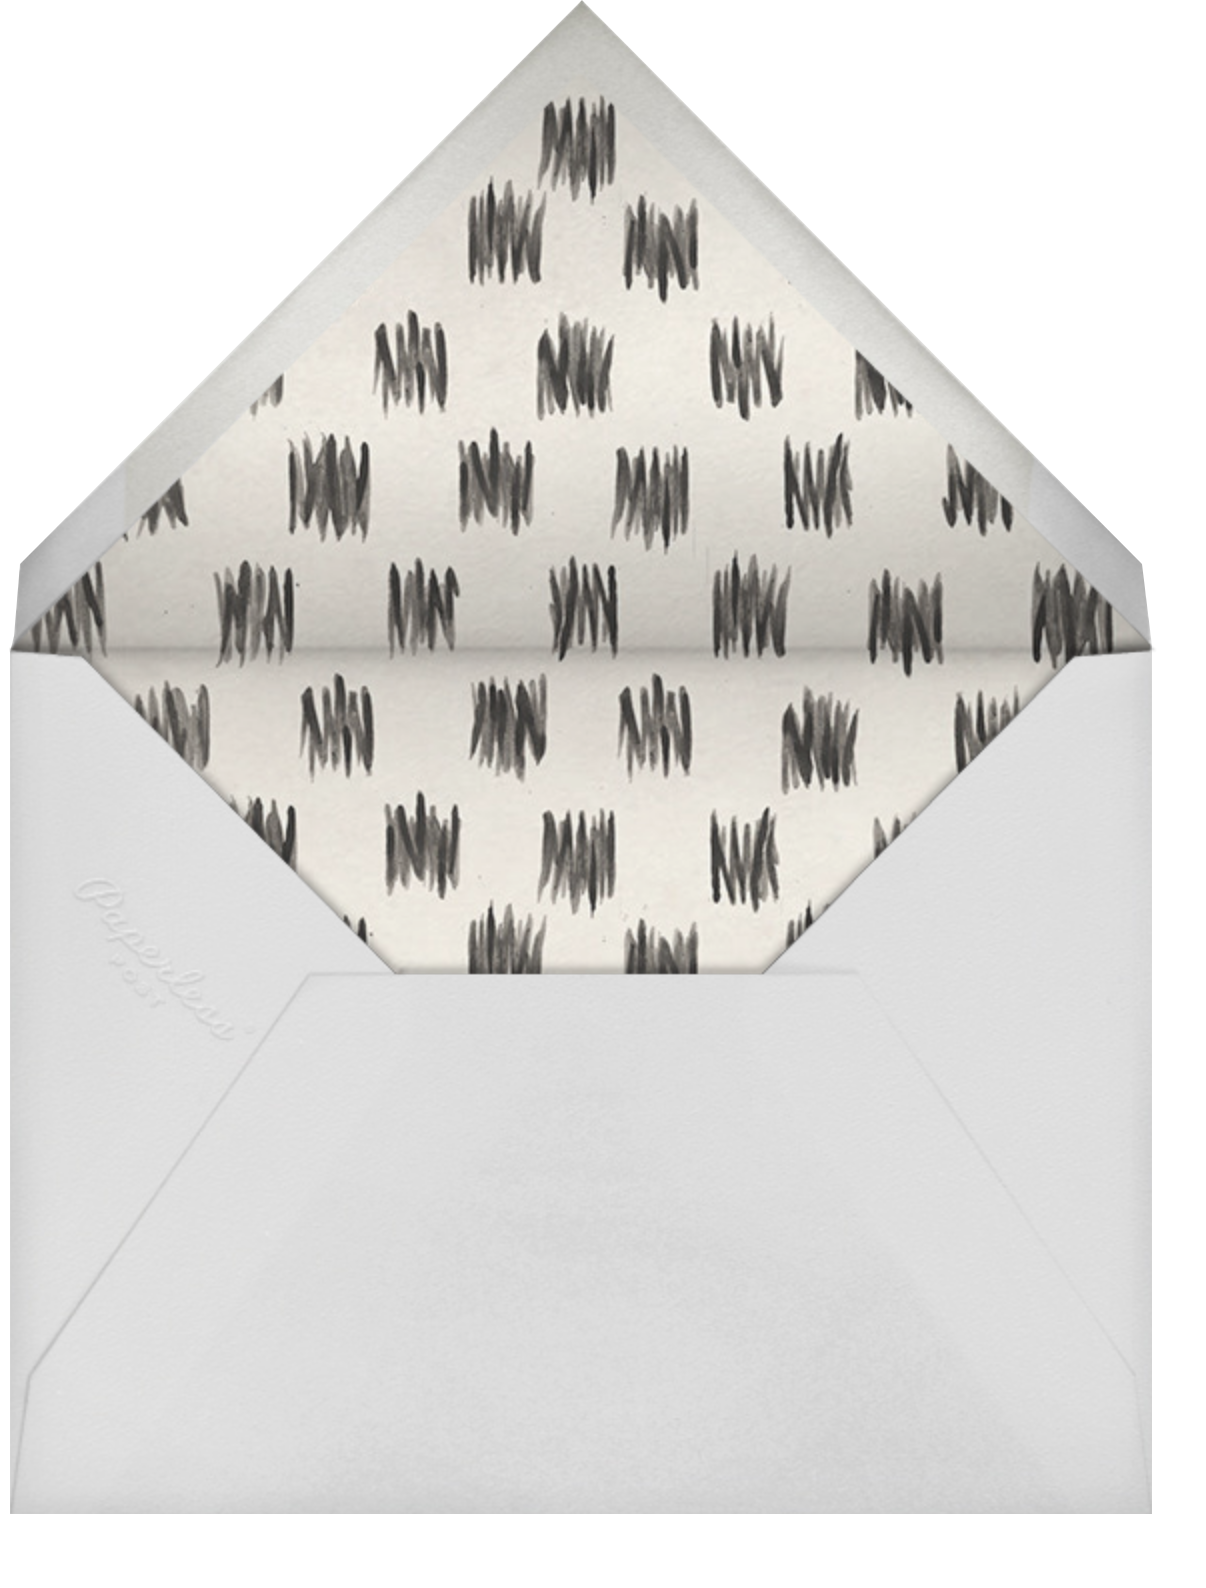 Champagne Toast II - Kelly Wearstler - null - envelope back